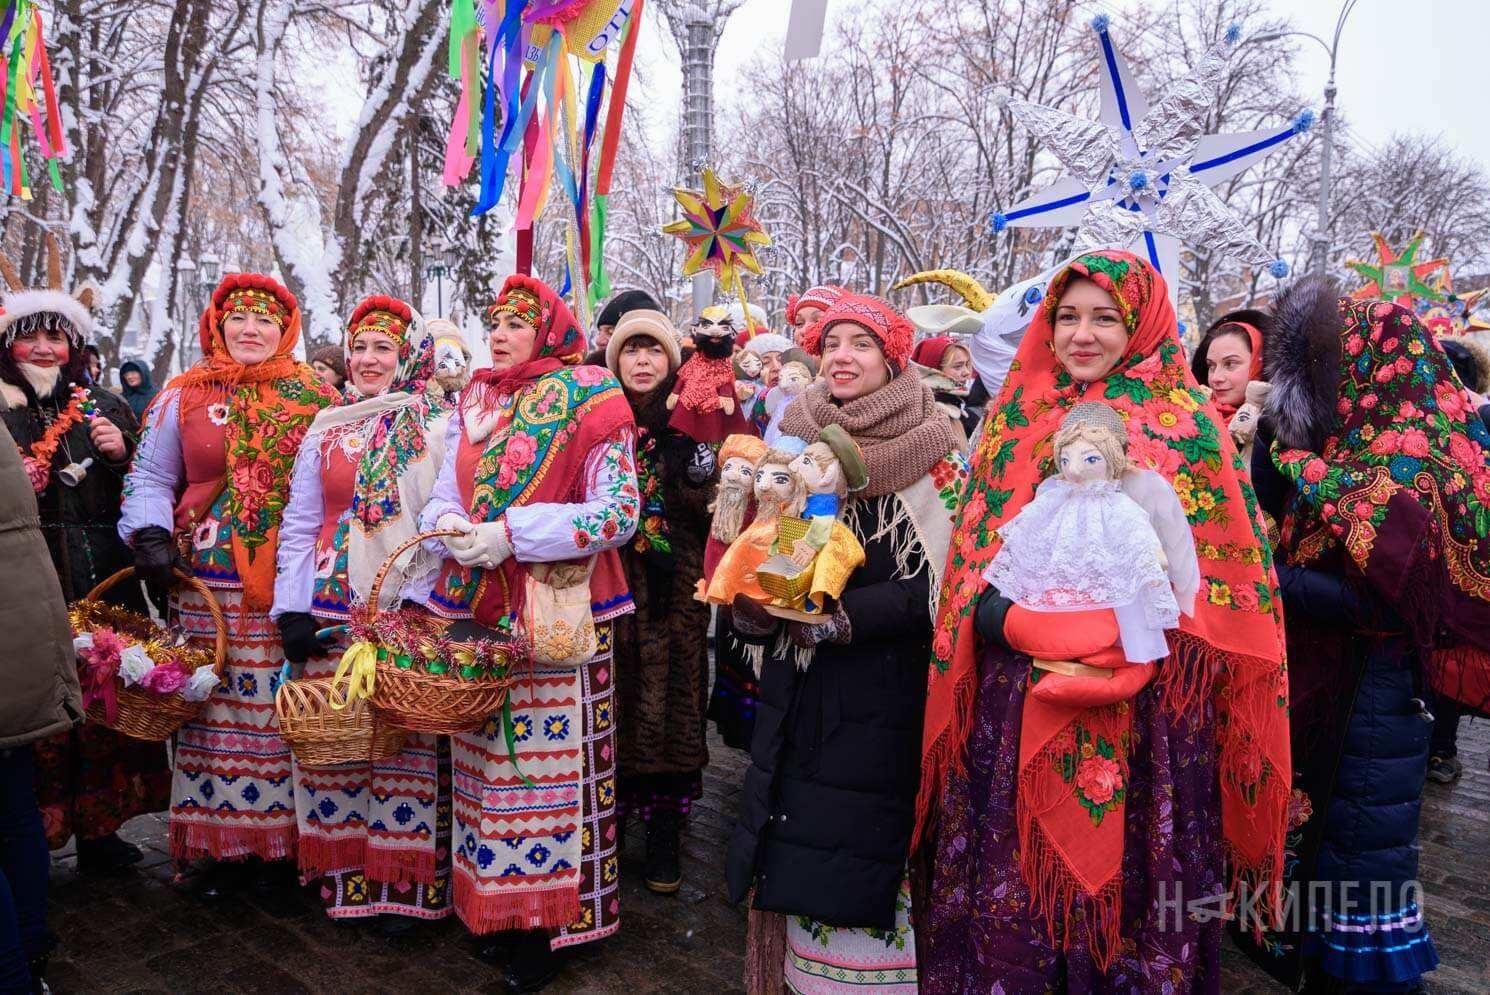 вертеп фест зима колядка украина традиция славимо иисуса иисус народився гуляние праздник зима харьков